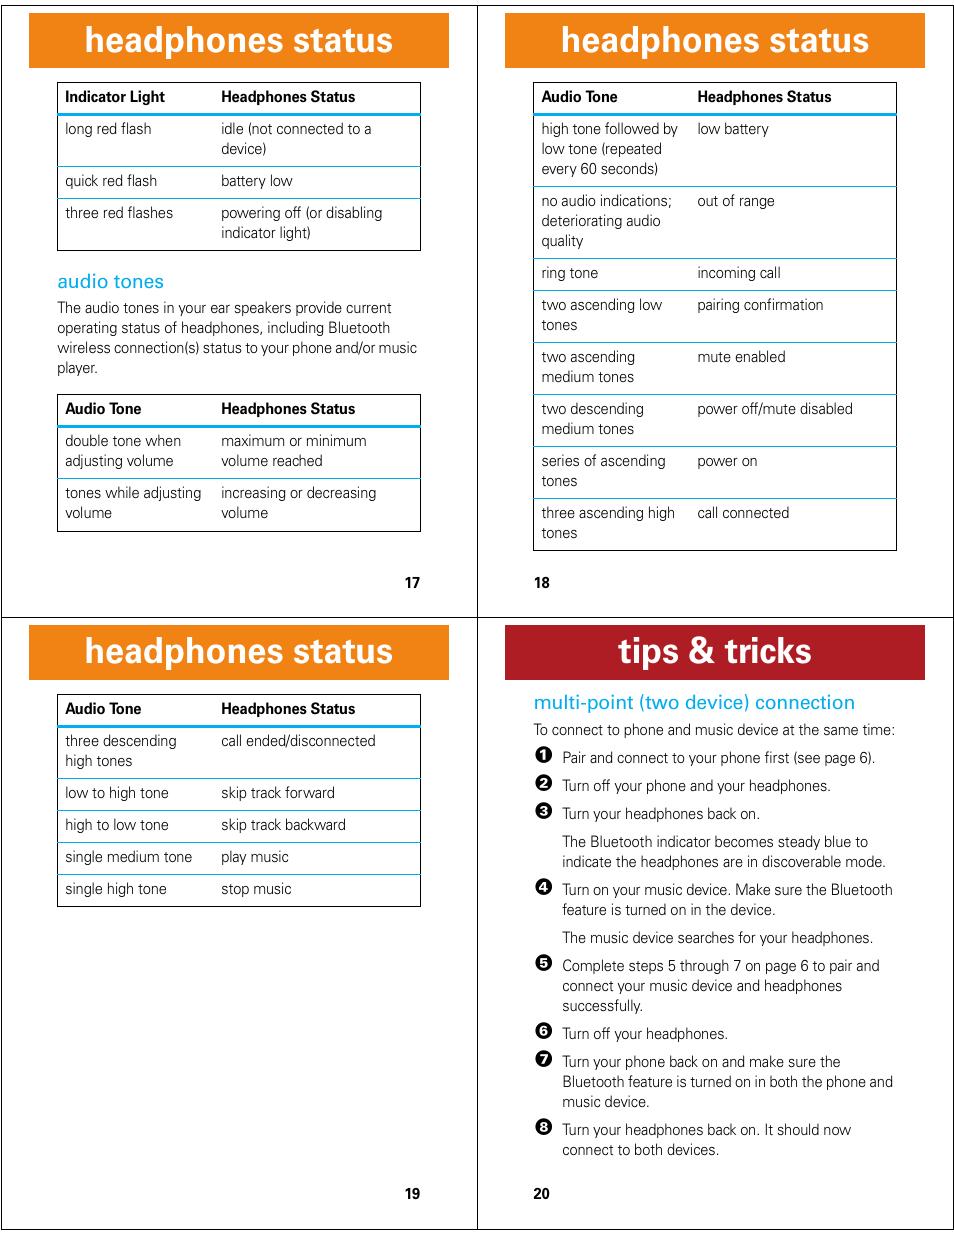 headphones status tips tricks motorola motorokr s9 hd user rh manualsdir com motorola rokr s9 hd manual Motorola S9 Review